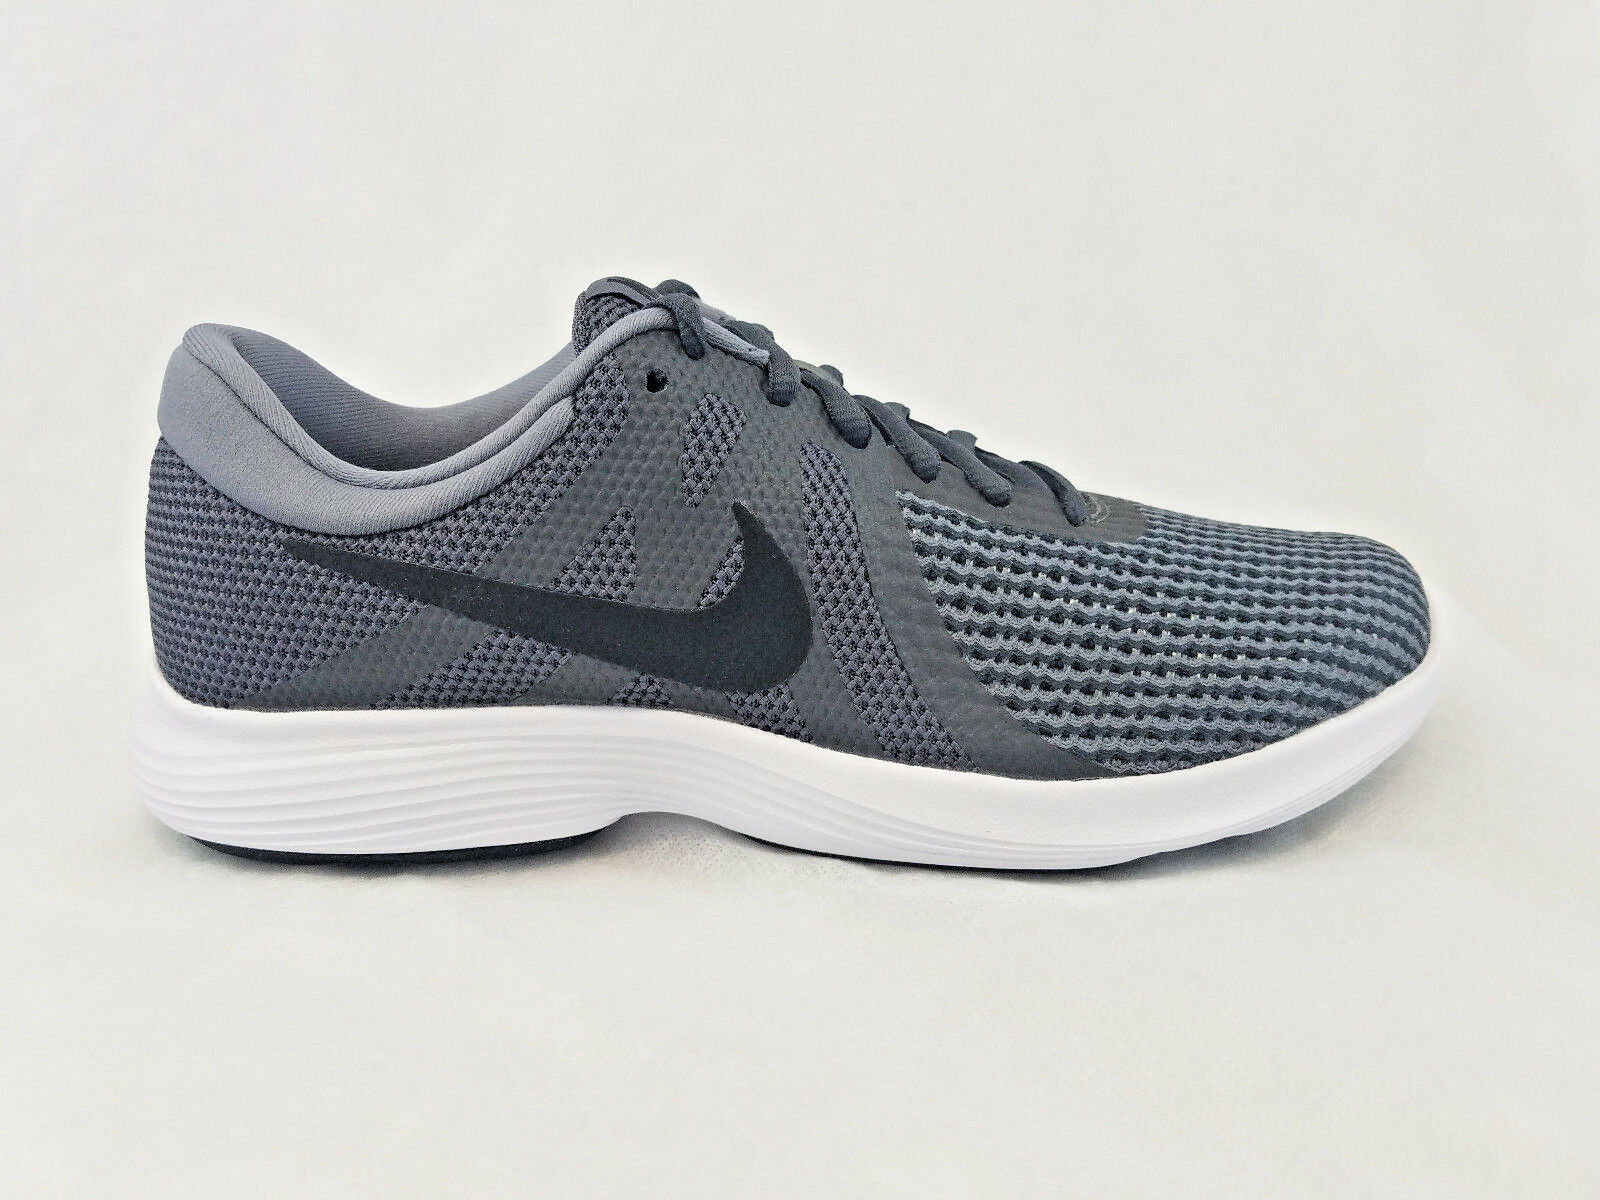 Nike Revolution 4 DARK GREY/BLACK MENS SIZE 7.5